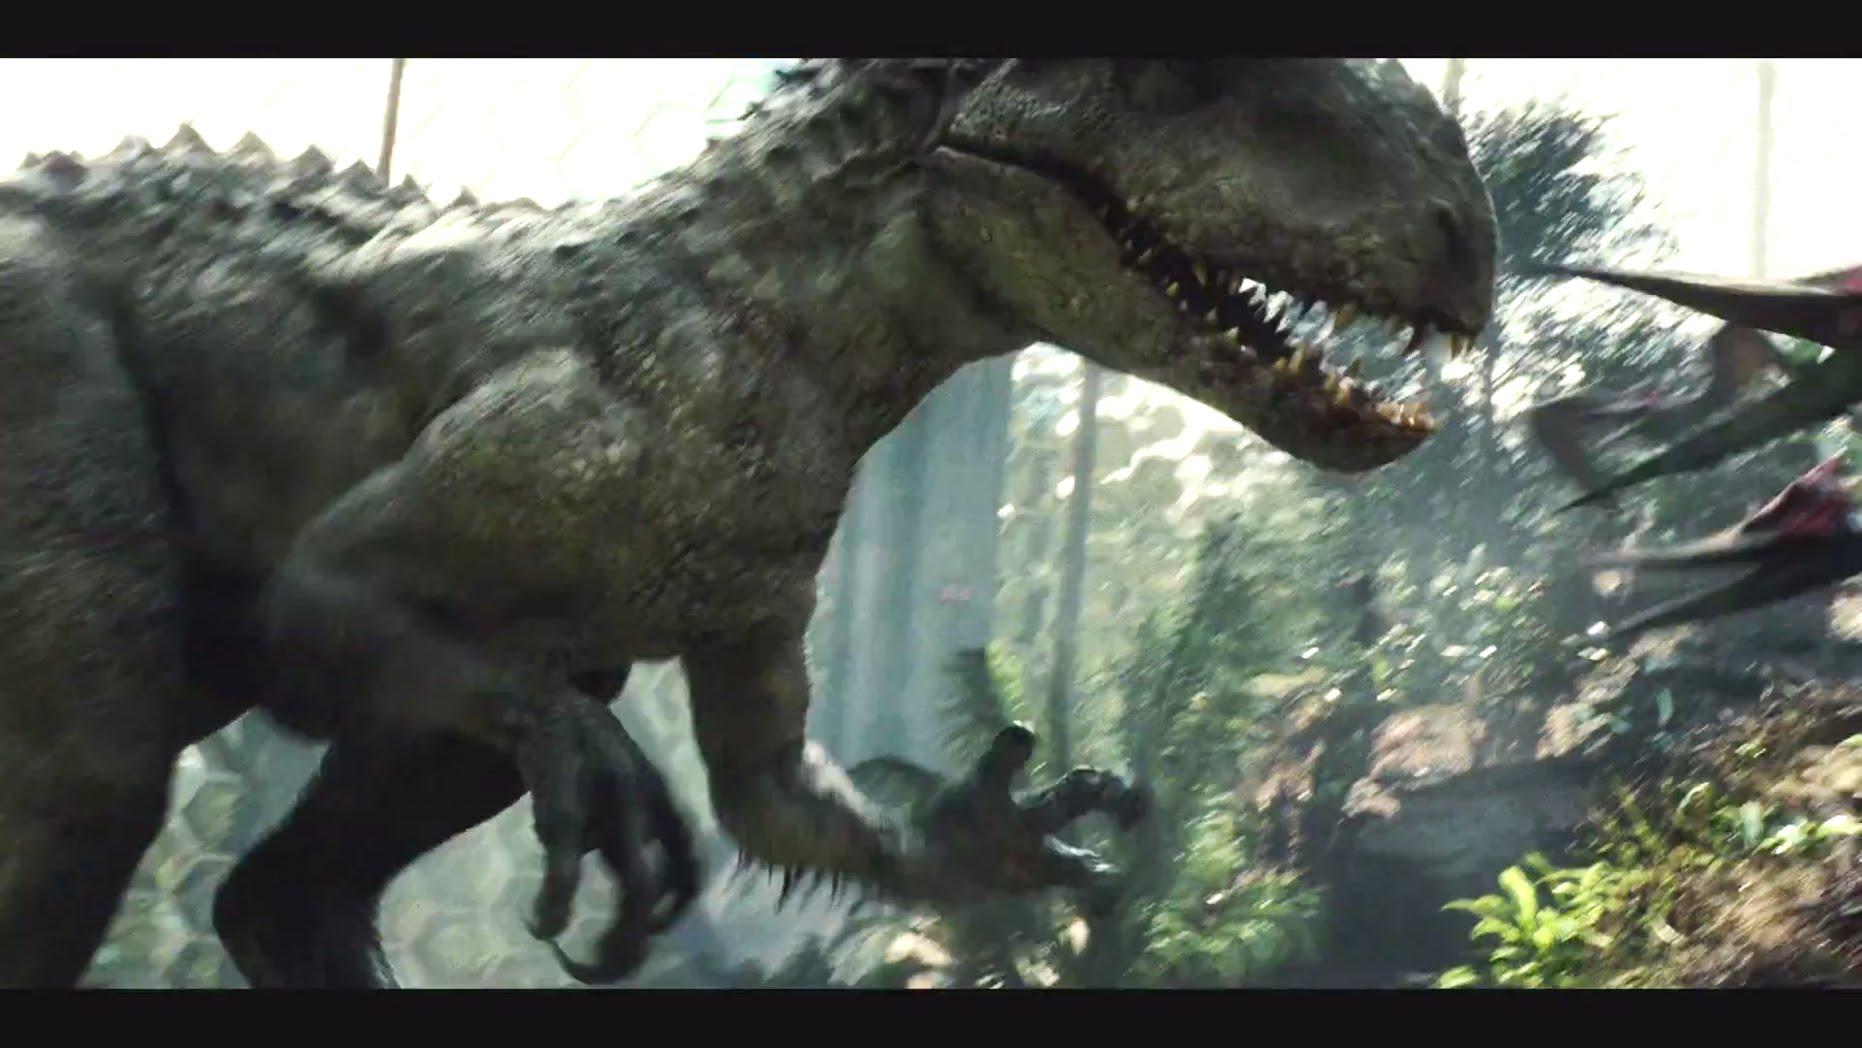 Jurassic Park T Rex Wallpaper - WallpaperSafari